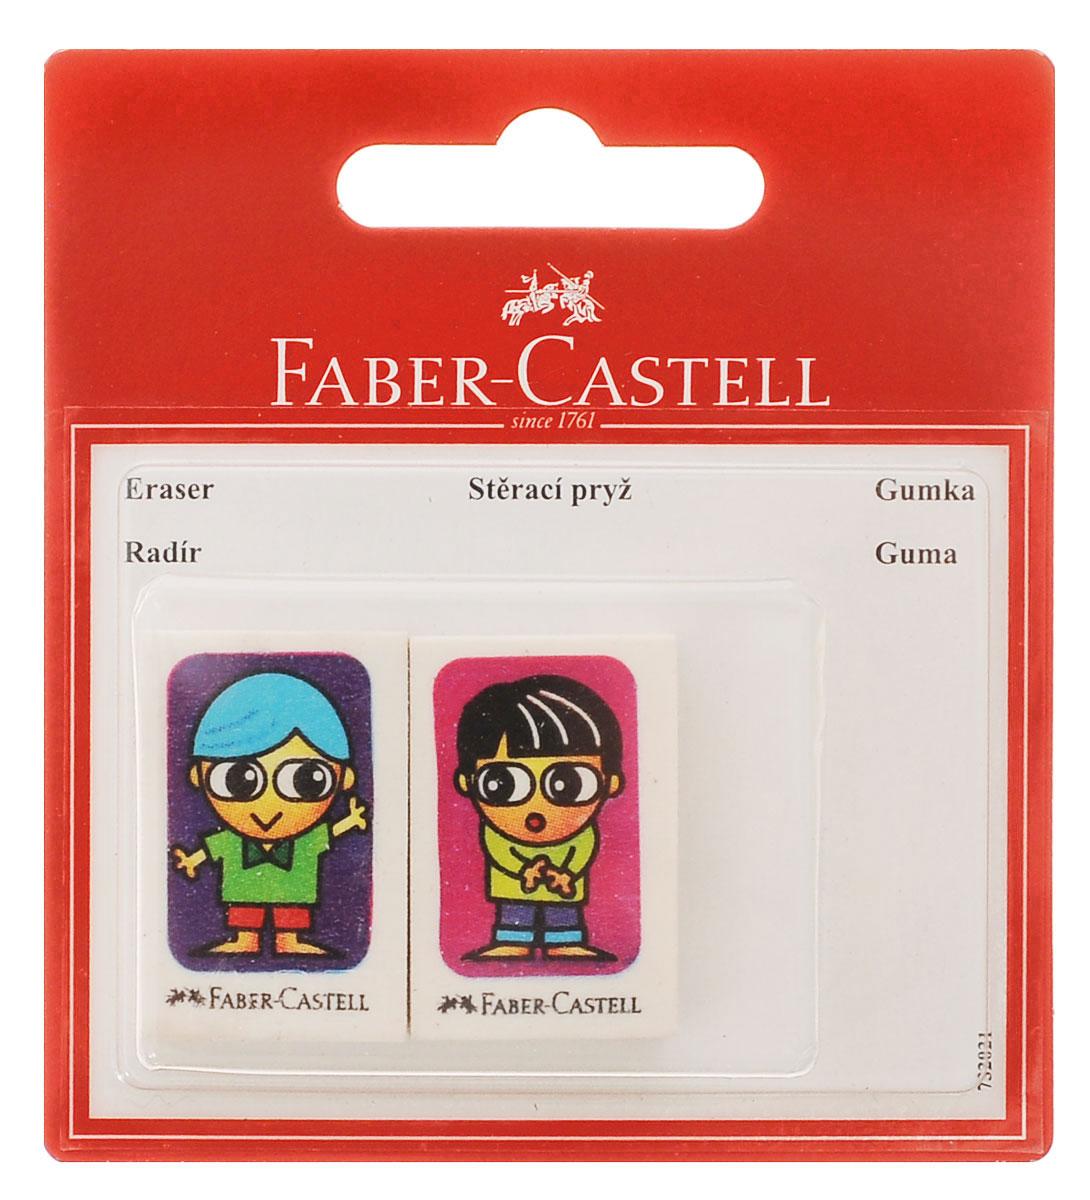 Faber-Castell Ластик Друзья 2 шт